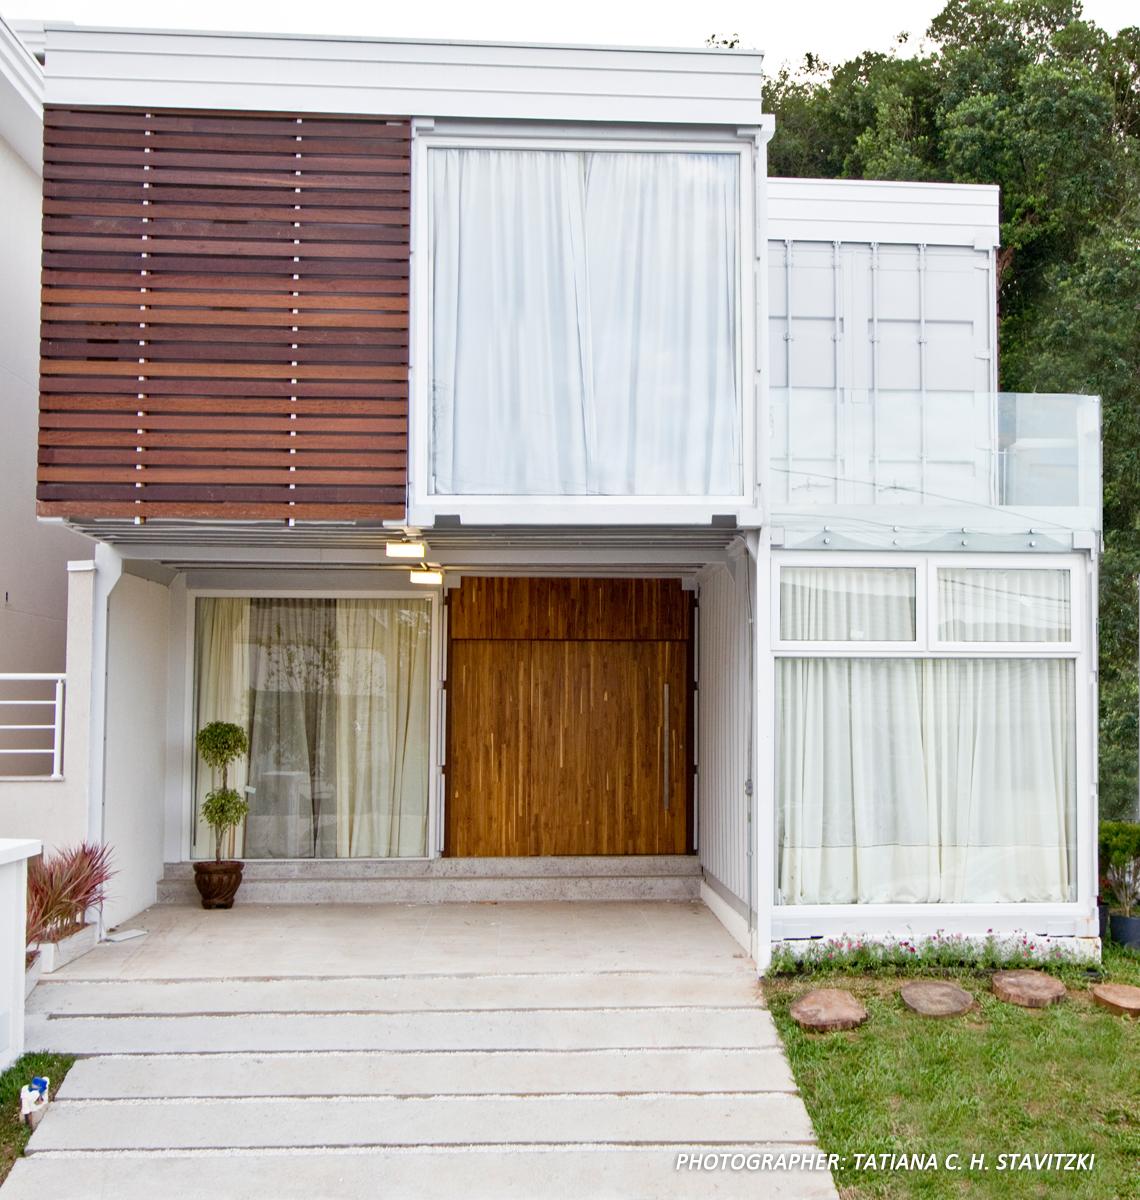 Brasil Estúdio Fotográfico: Delta Containers Casas modulares #6D452F 1140x1200 Banheiro Container Brasilia